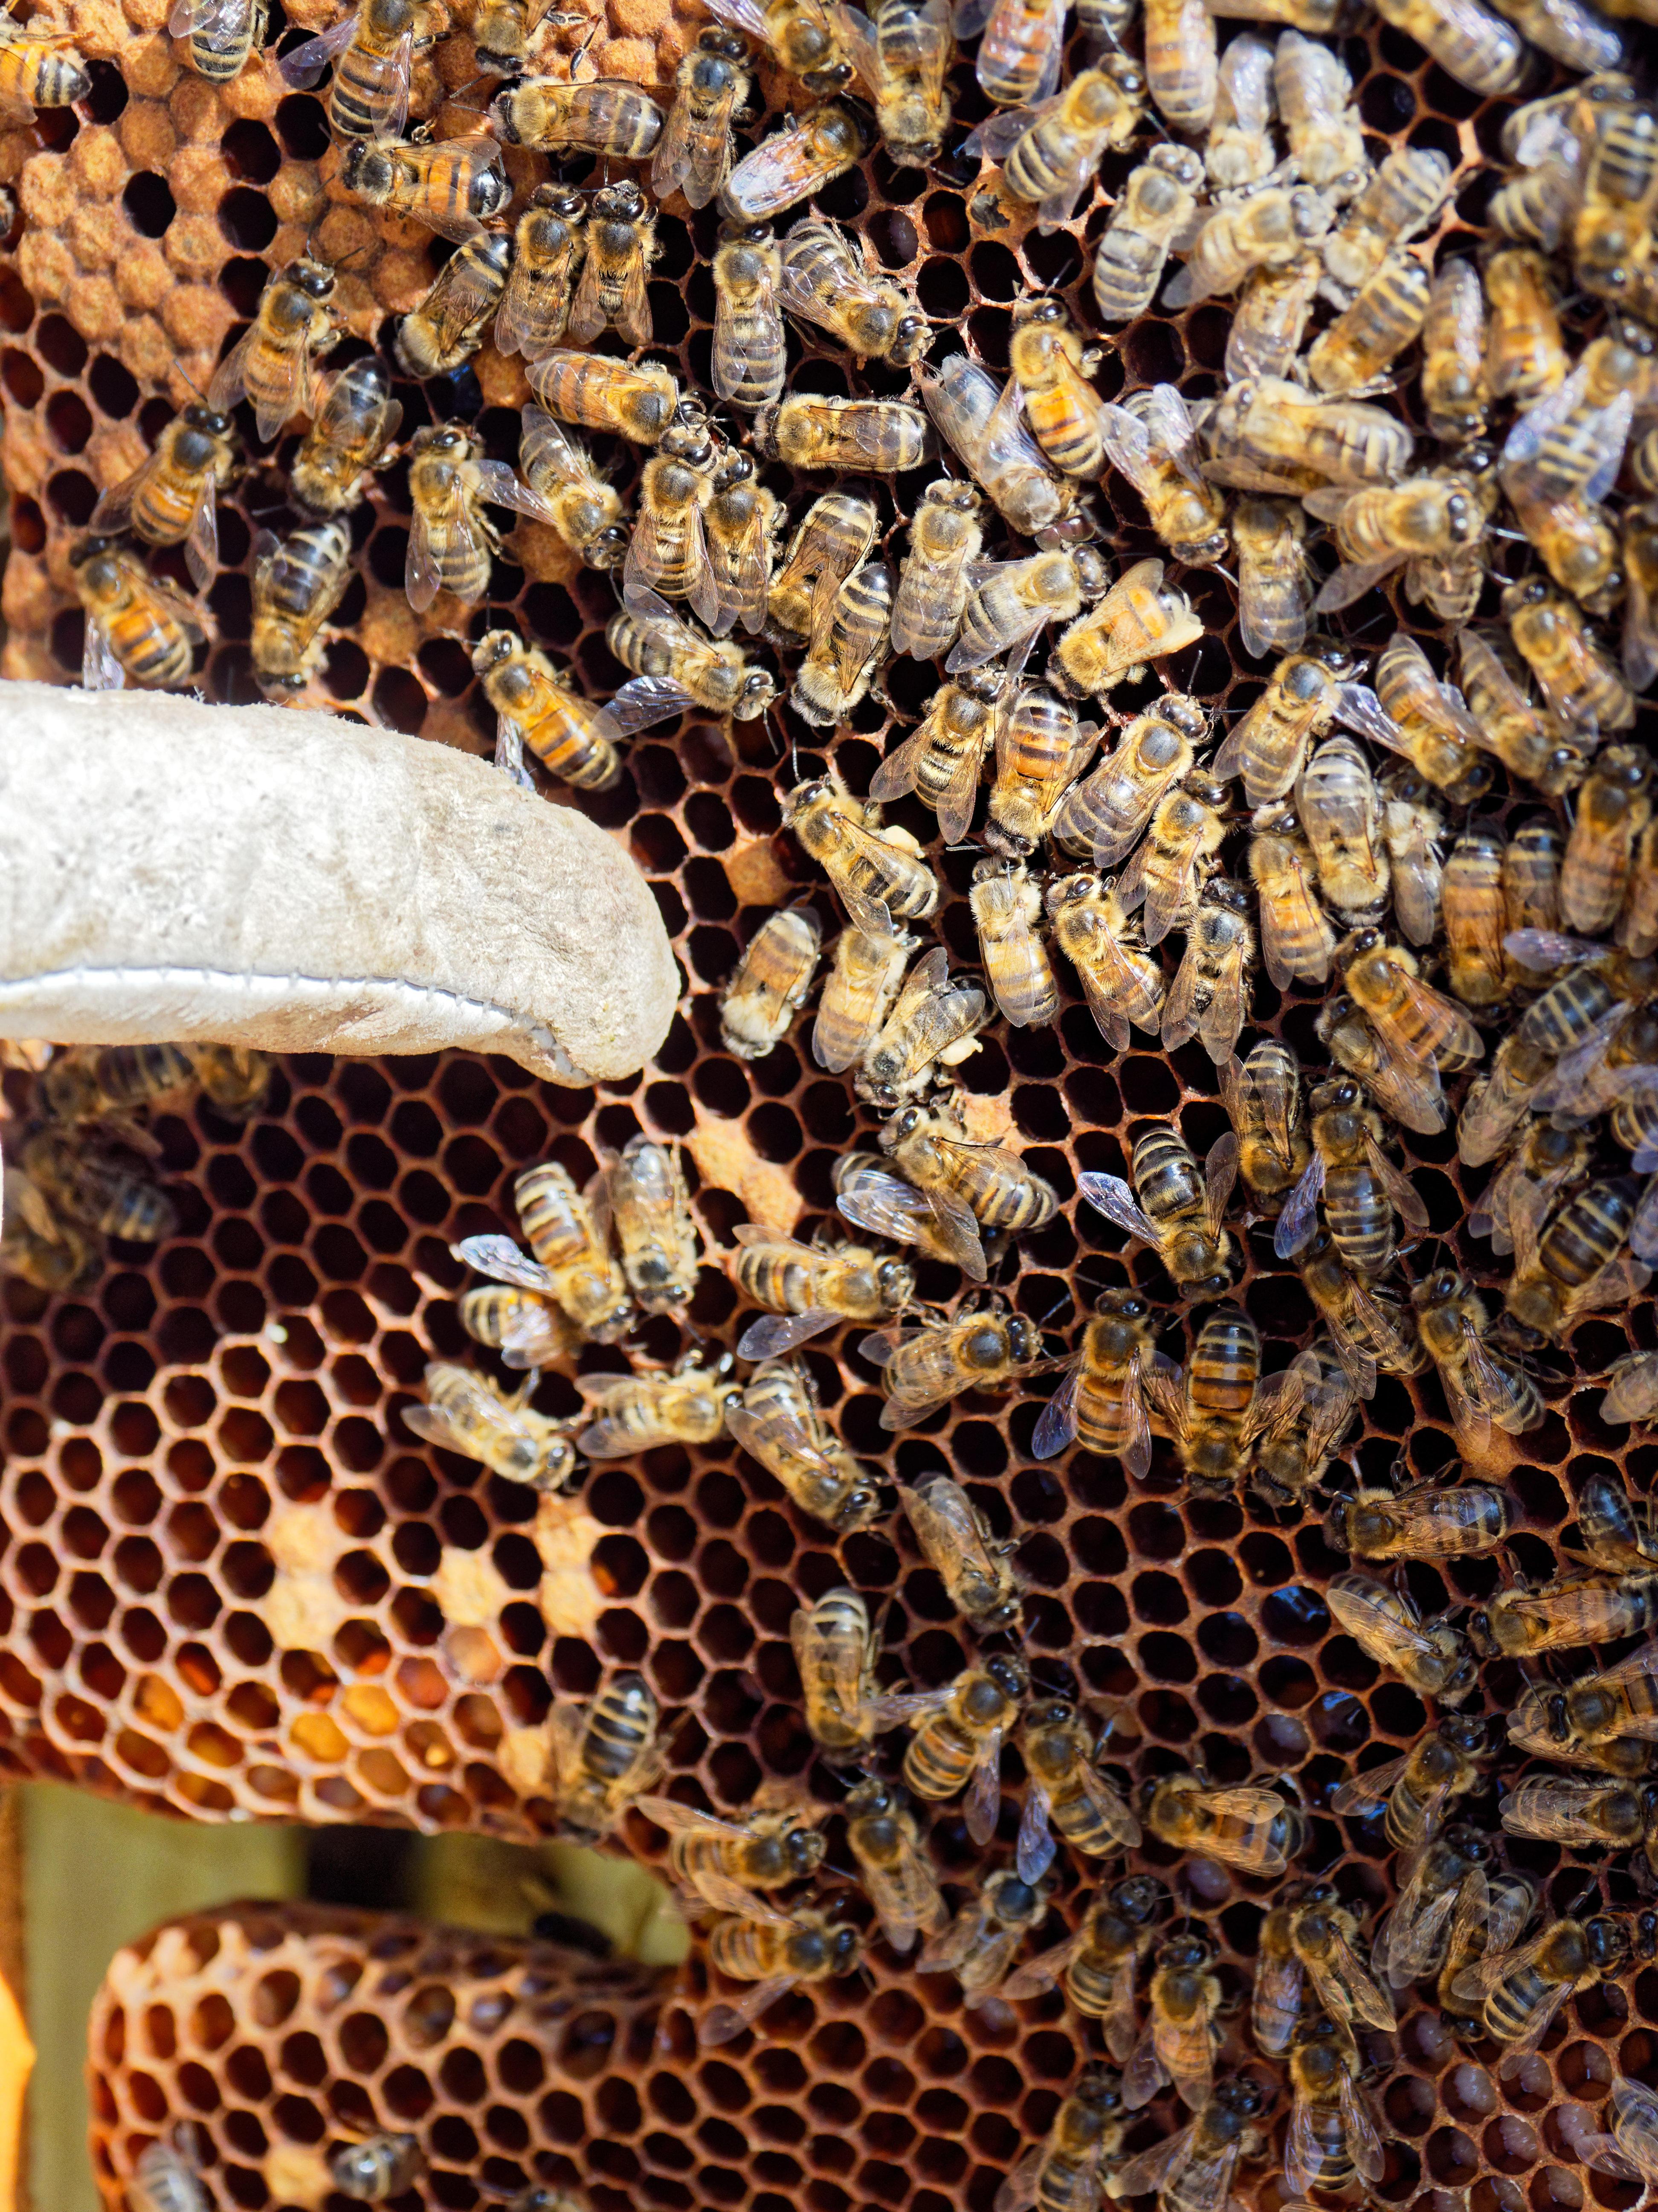 Inspecting-beehives-66.jpeg